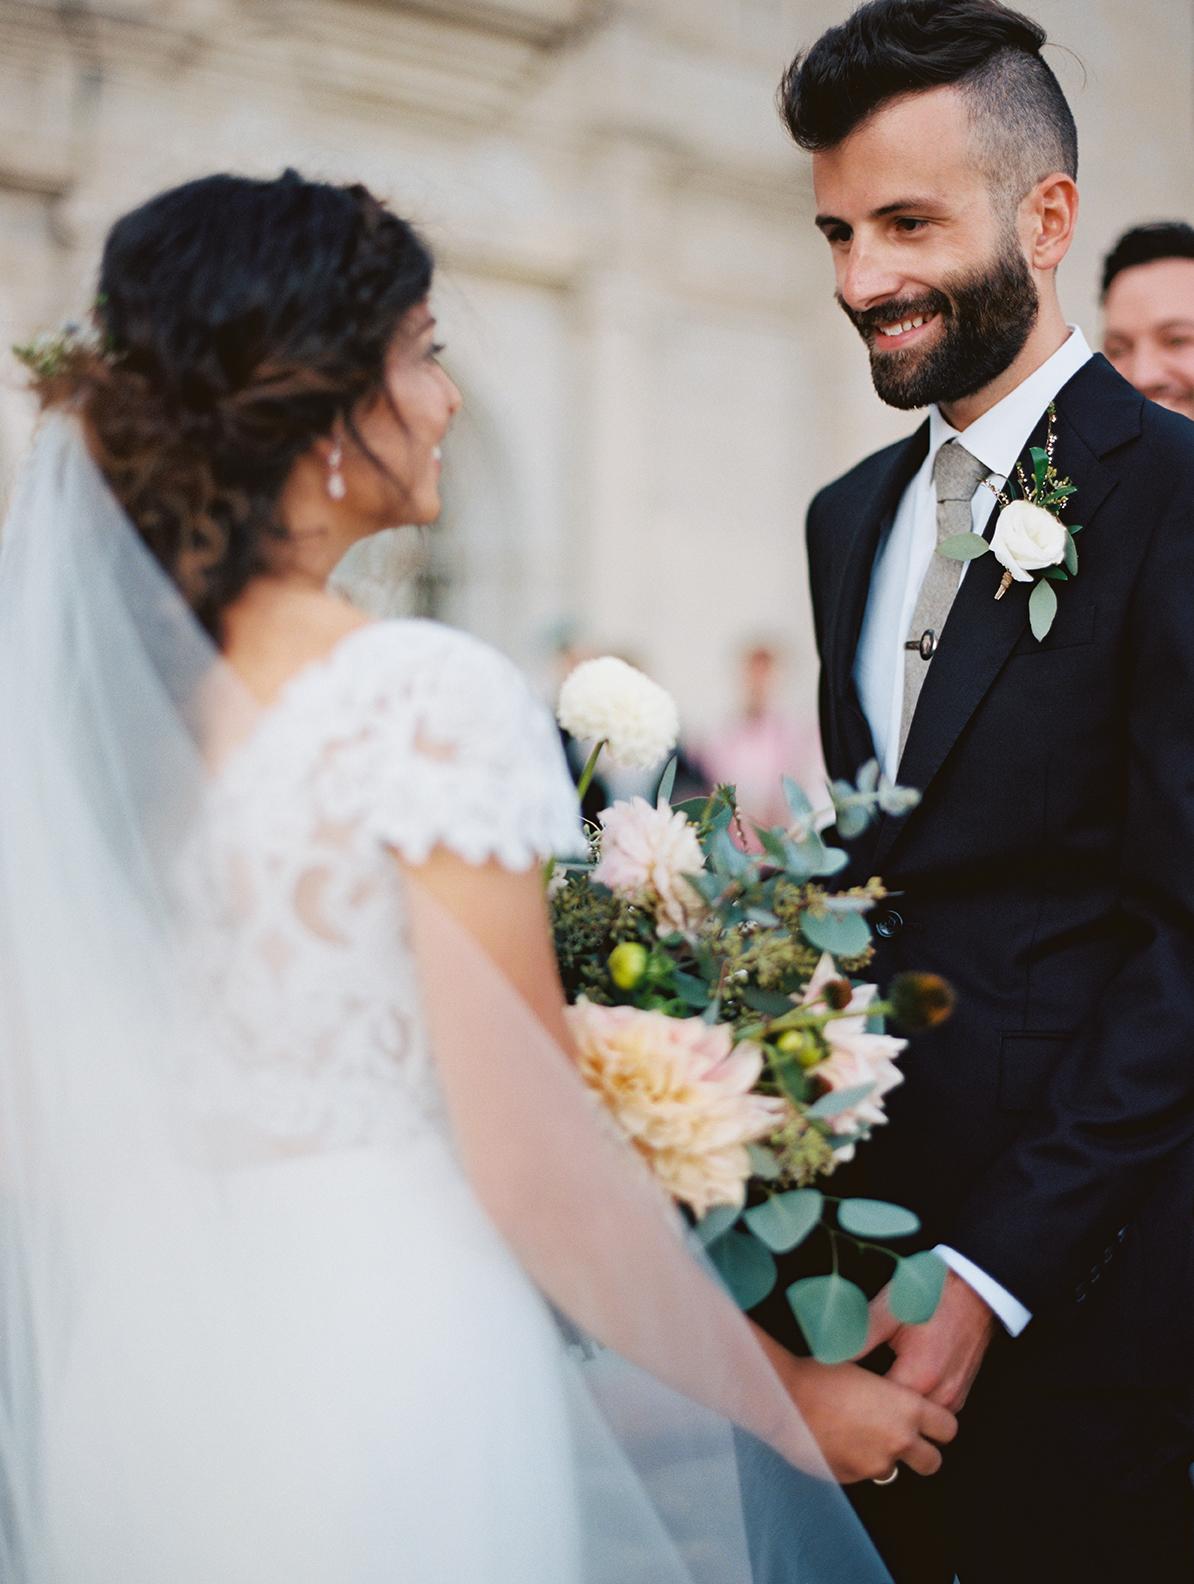 190-brian-sarra-los-angeles-wedding-brumley-wells-photography.jpg